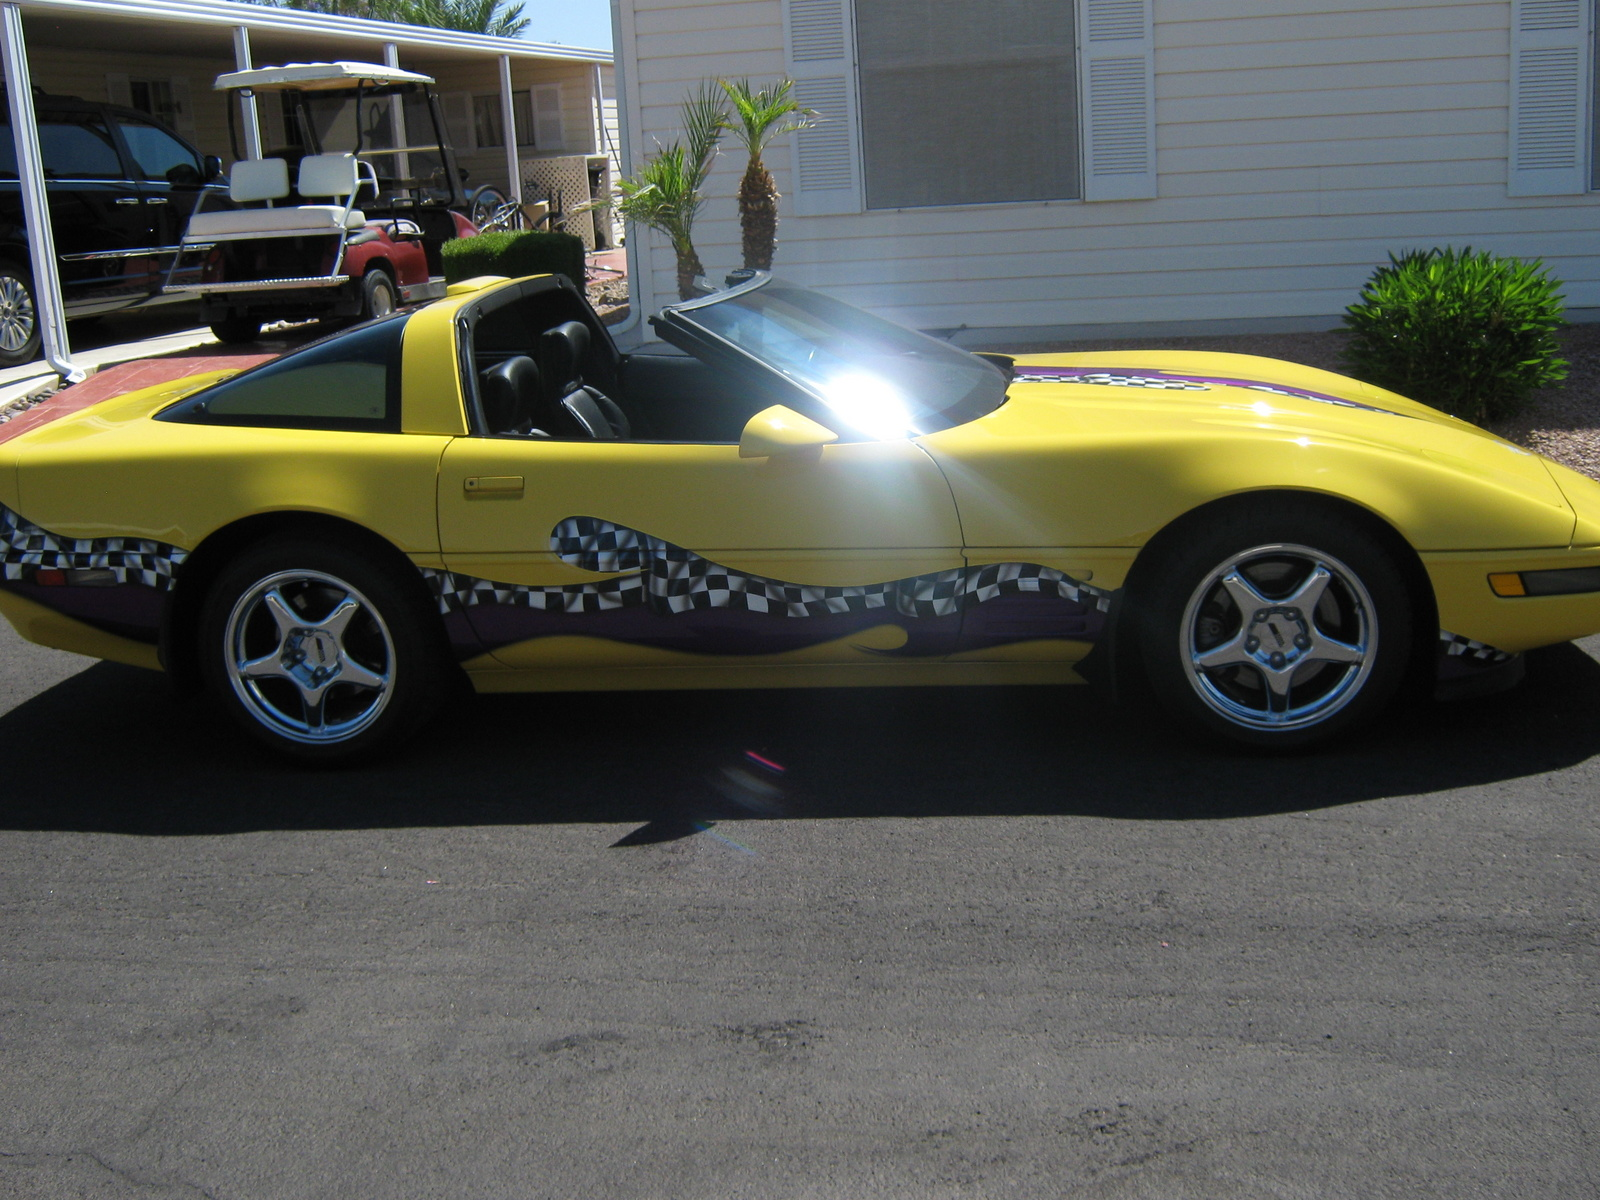 Wiring Diagram 1991 Chevy Corvette Schematics Diagrams C4 Power Seat Engine Also Volt As Well Chevrolet 1979 Pdf Antenna